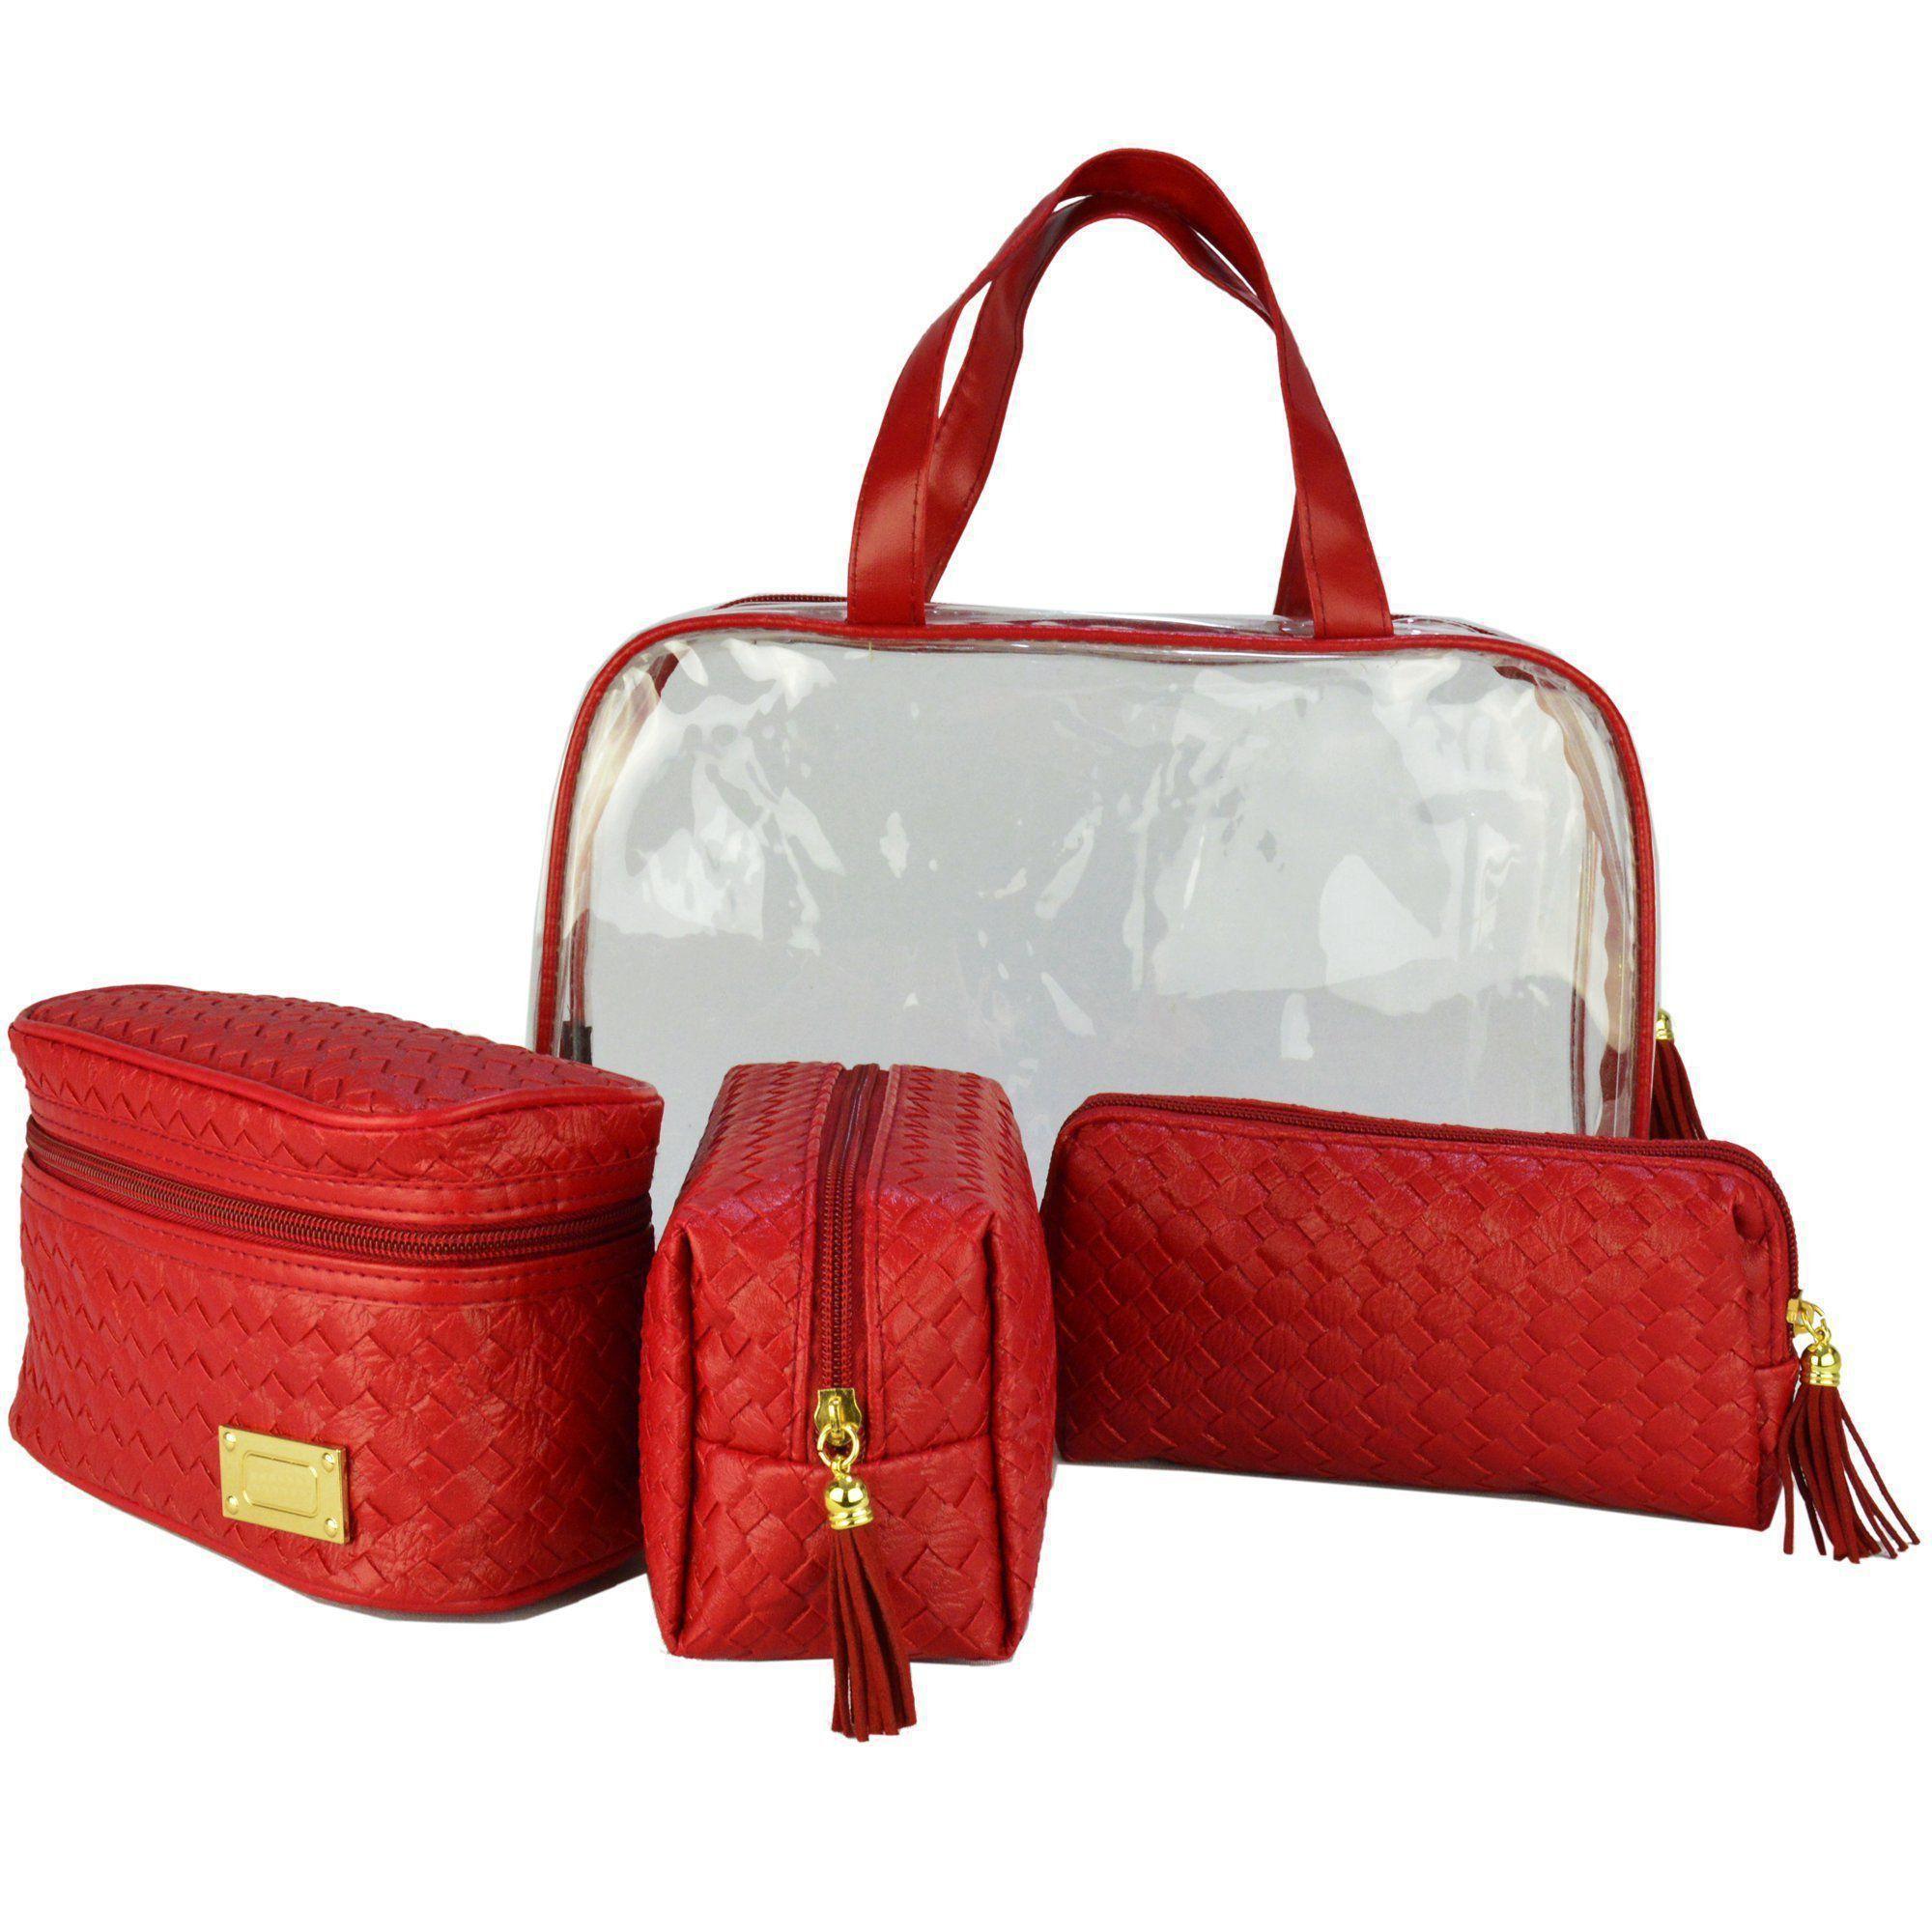 Frasqueiras Necessaire Feminina Luxo Vermelho Kit 4 Peças CBRN08247